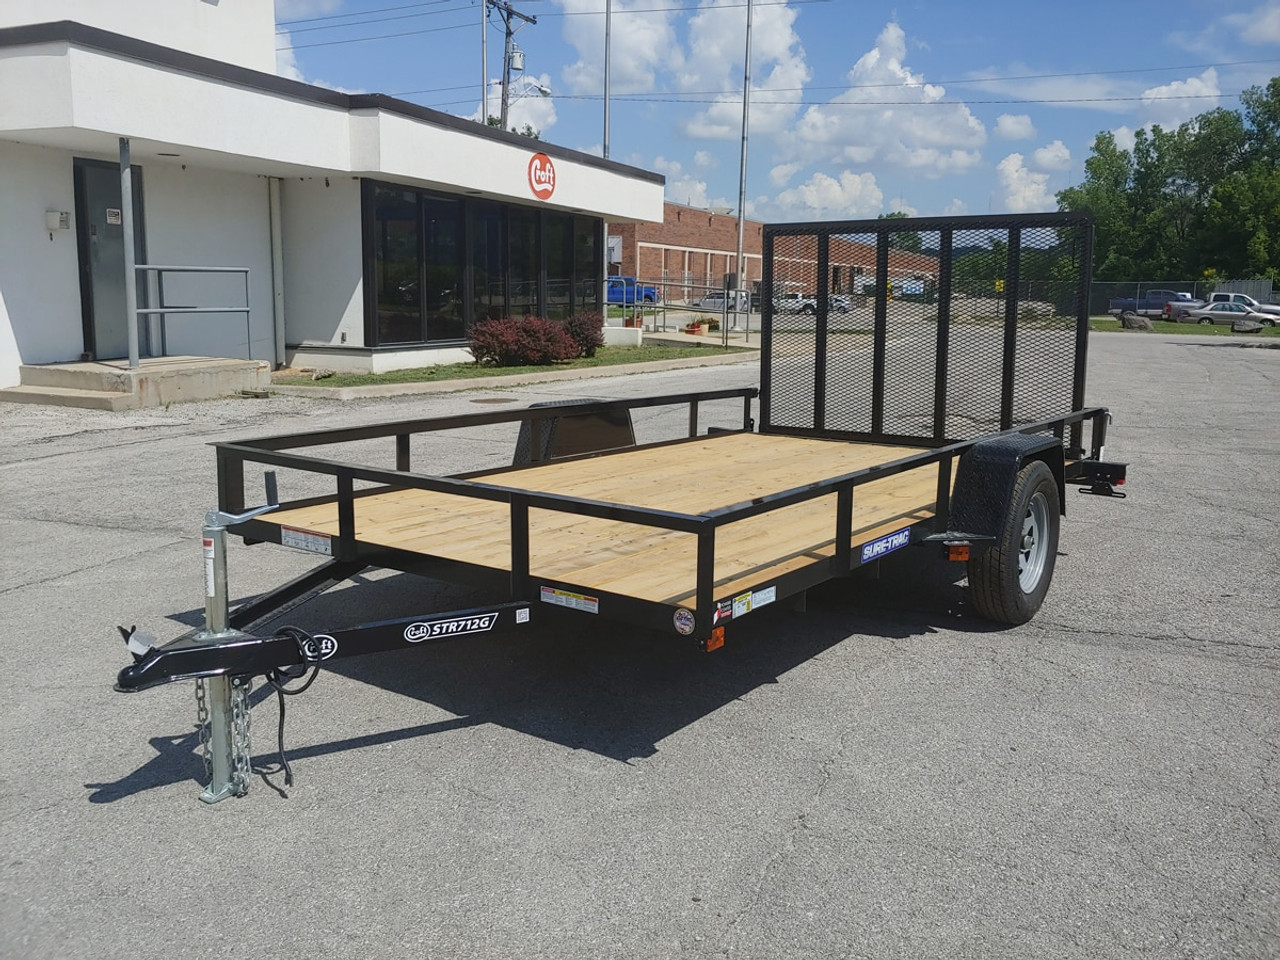 STR712G --- 2021 Sure-Trac 7'x12' Utility Trailer - #ST4785